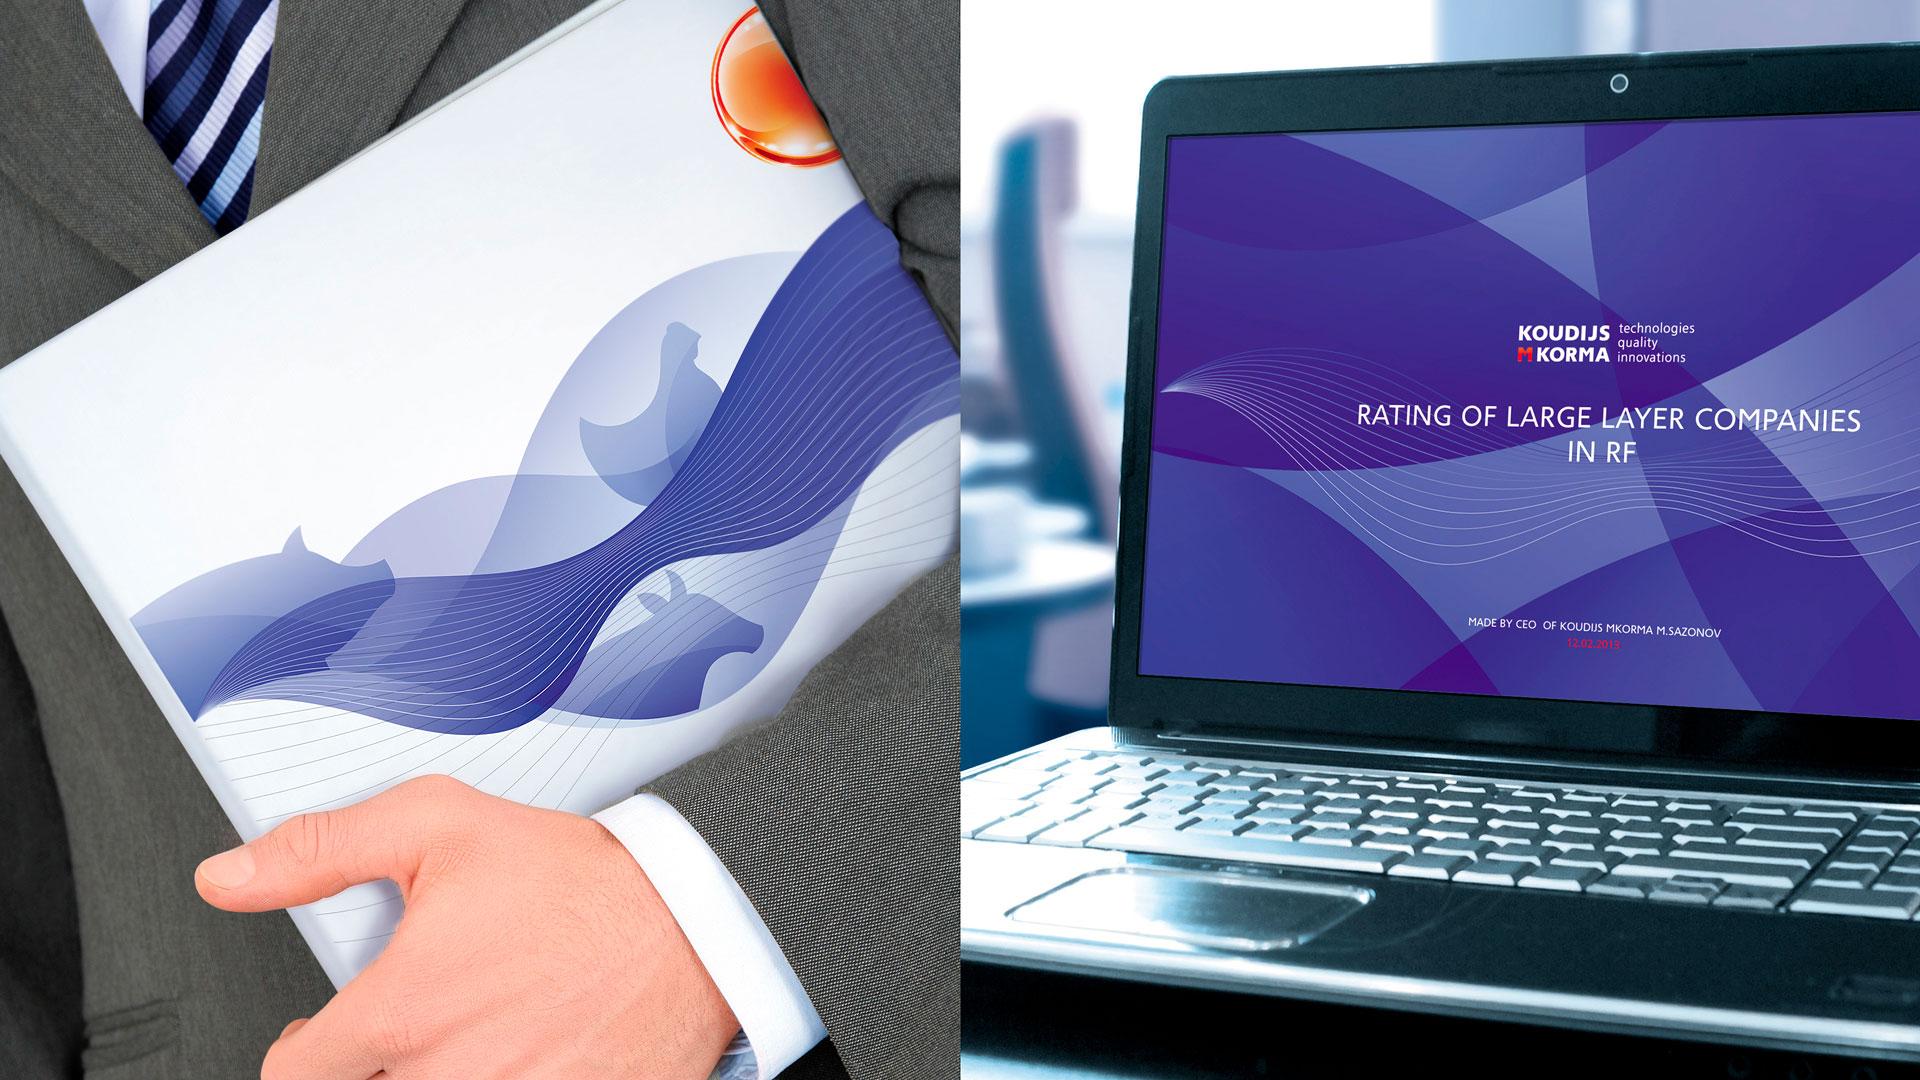 Дизайн буклета и слайдов презентации